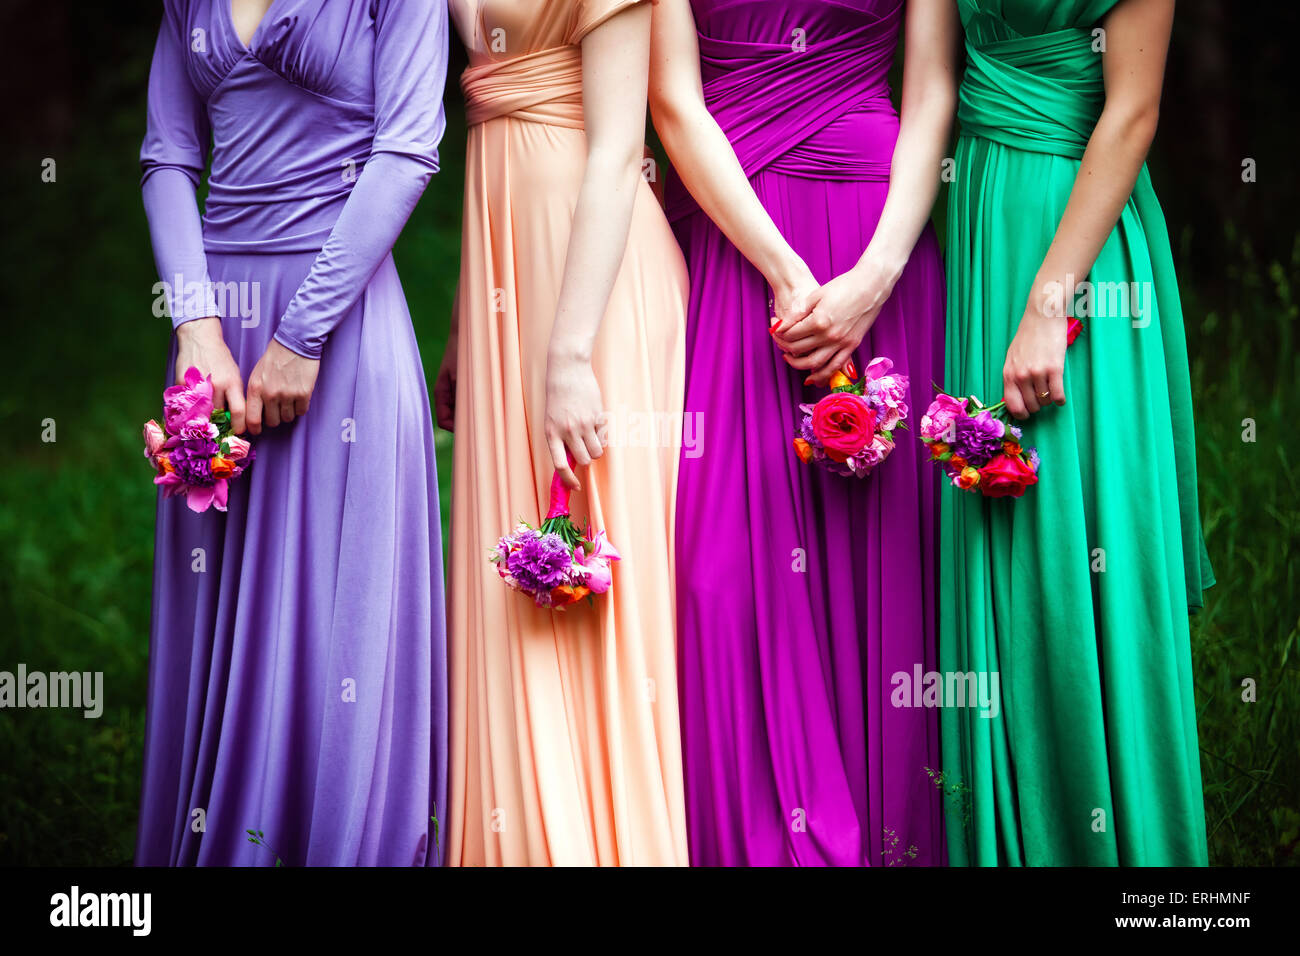 Bridesmaids Dresses Stock Photos & Bridesmaids Dresses Stock Images ...